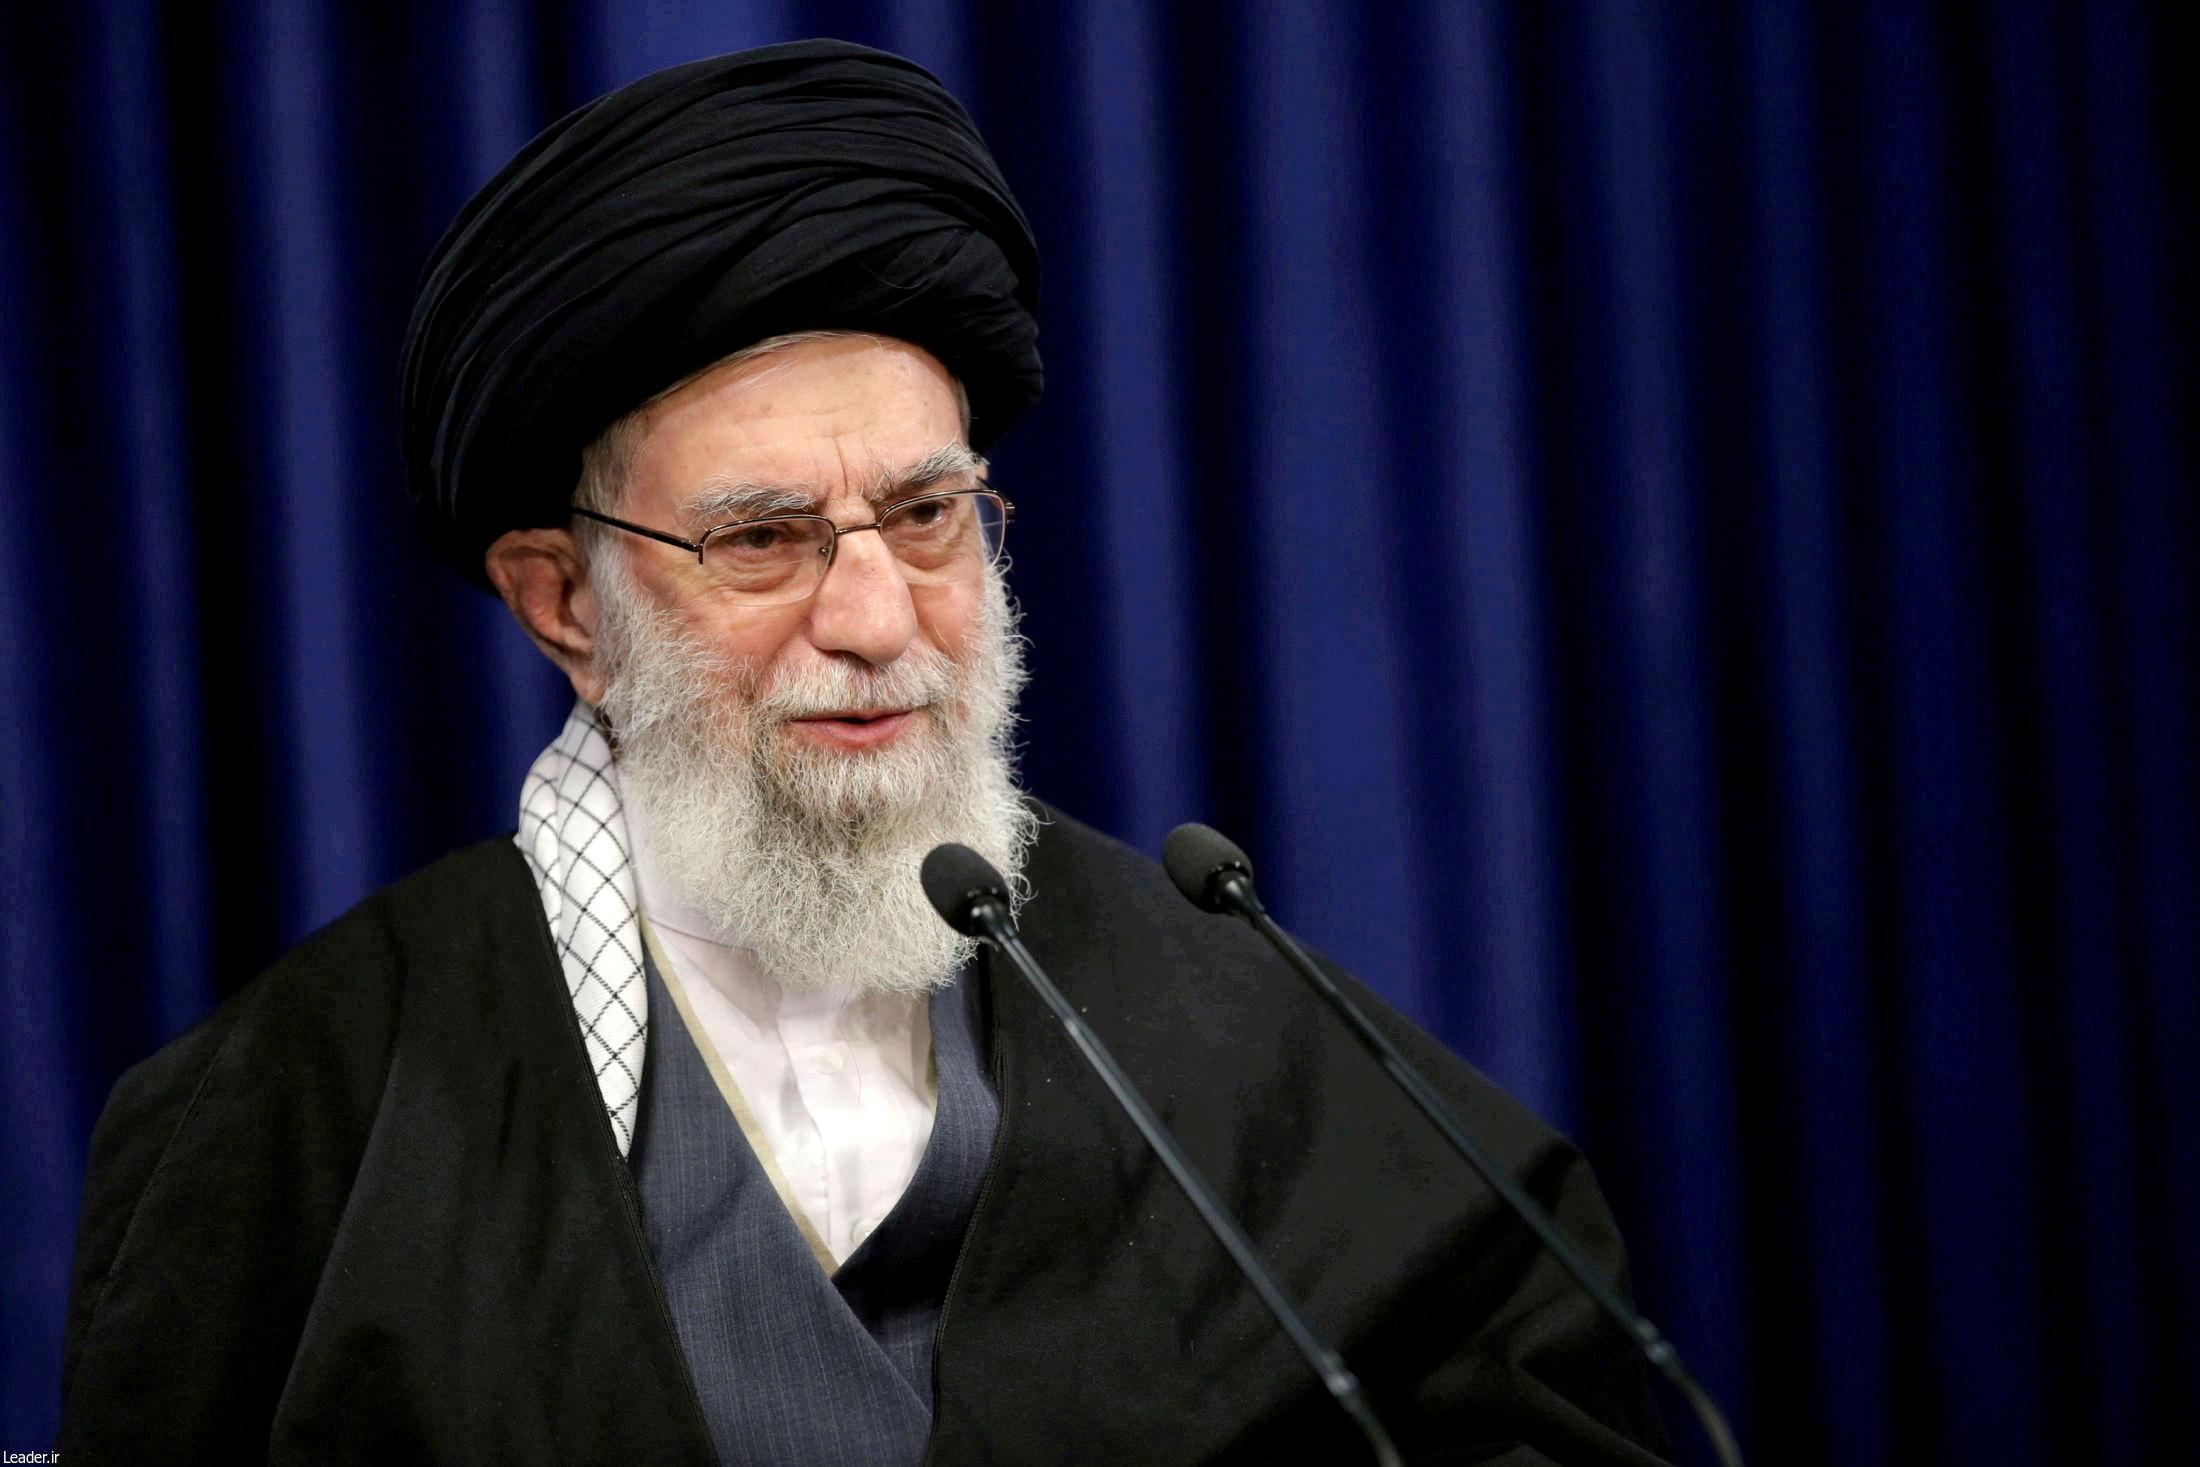 Iranian Supreme Leader Ayatollah Ali Khamenei delivers a televised speech in Tehran, Iran, January 8, 2021. Official Khamenei Website/Handout via REUTERS